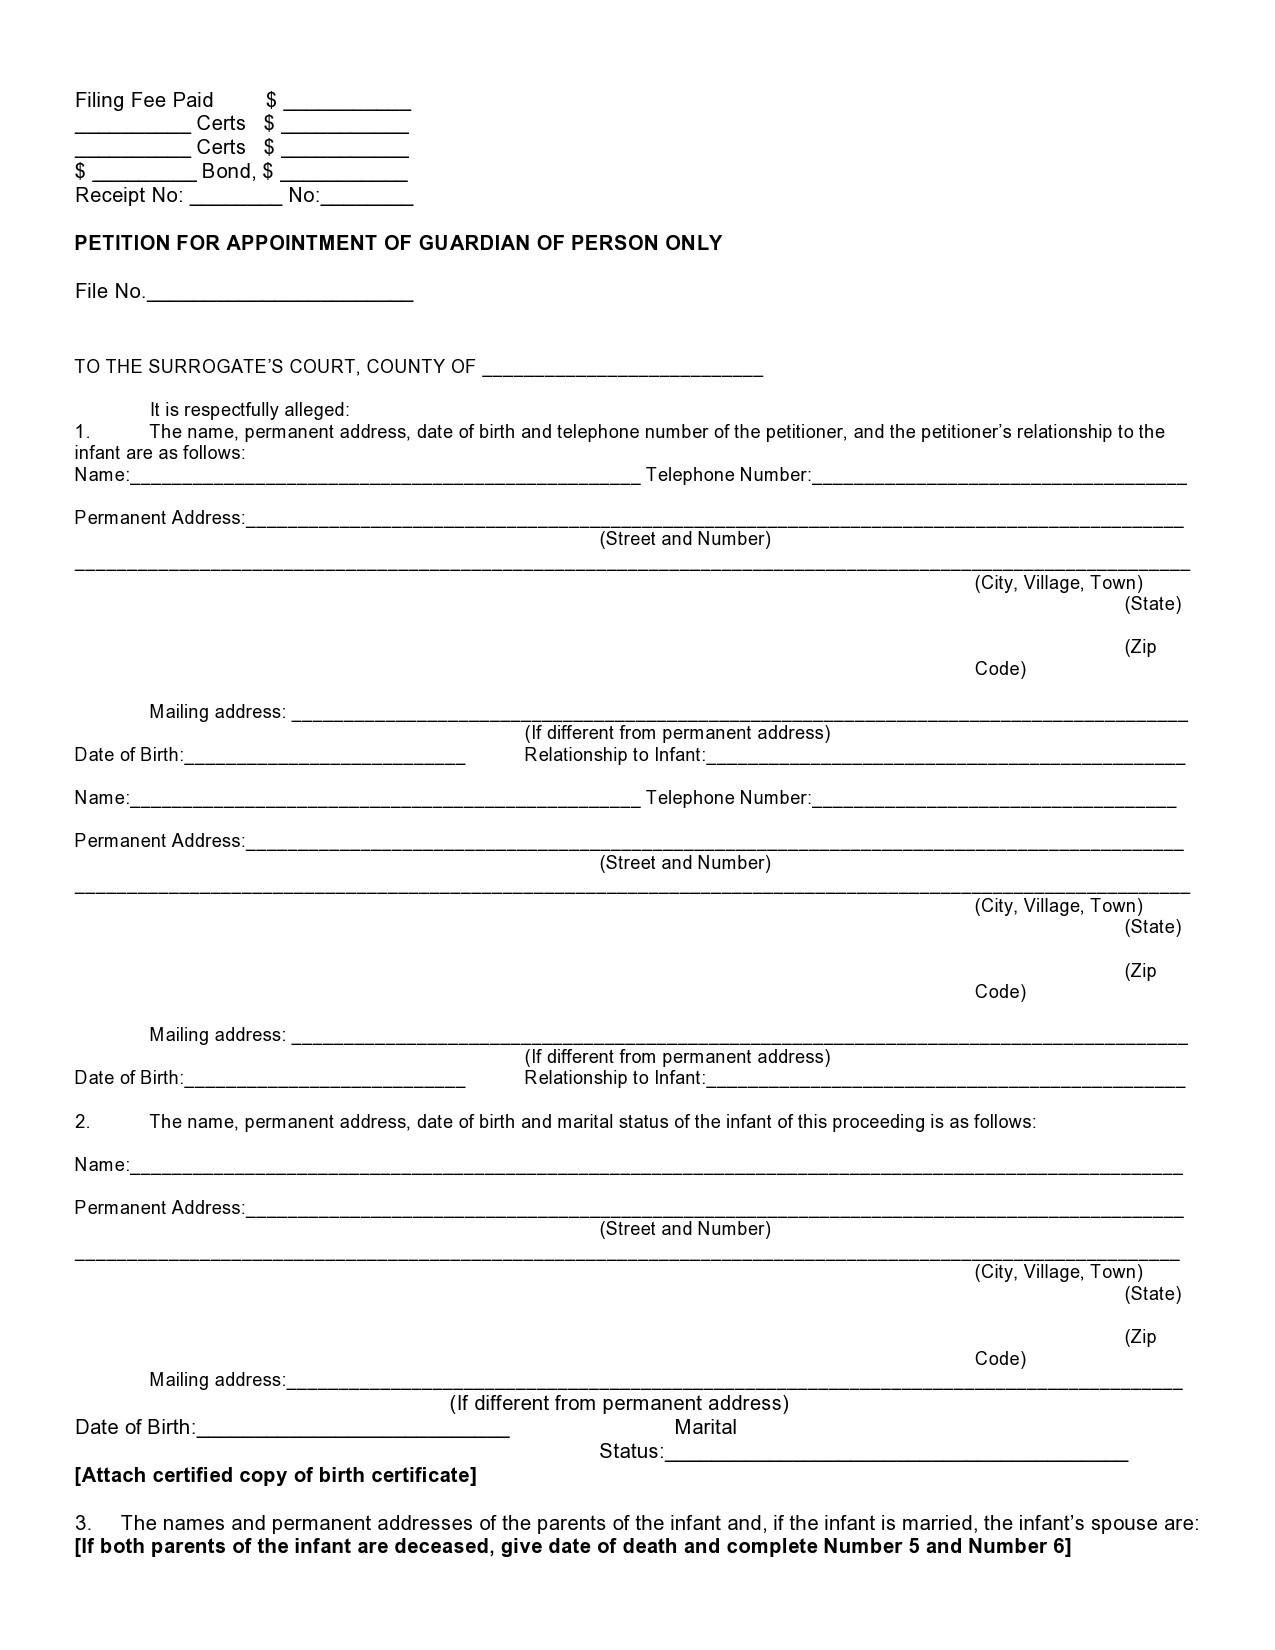 Free temporary guardianship form 12